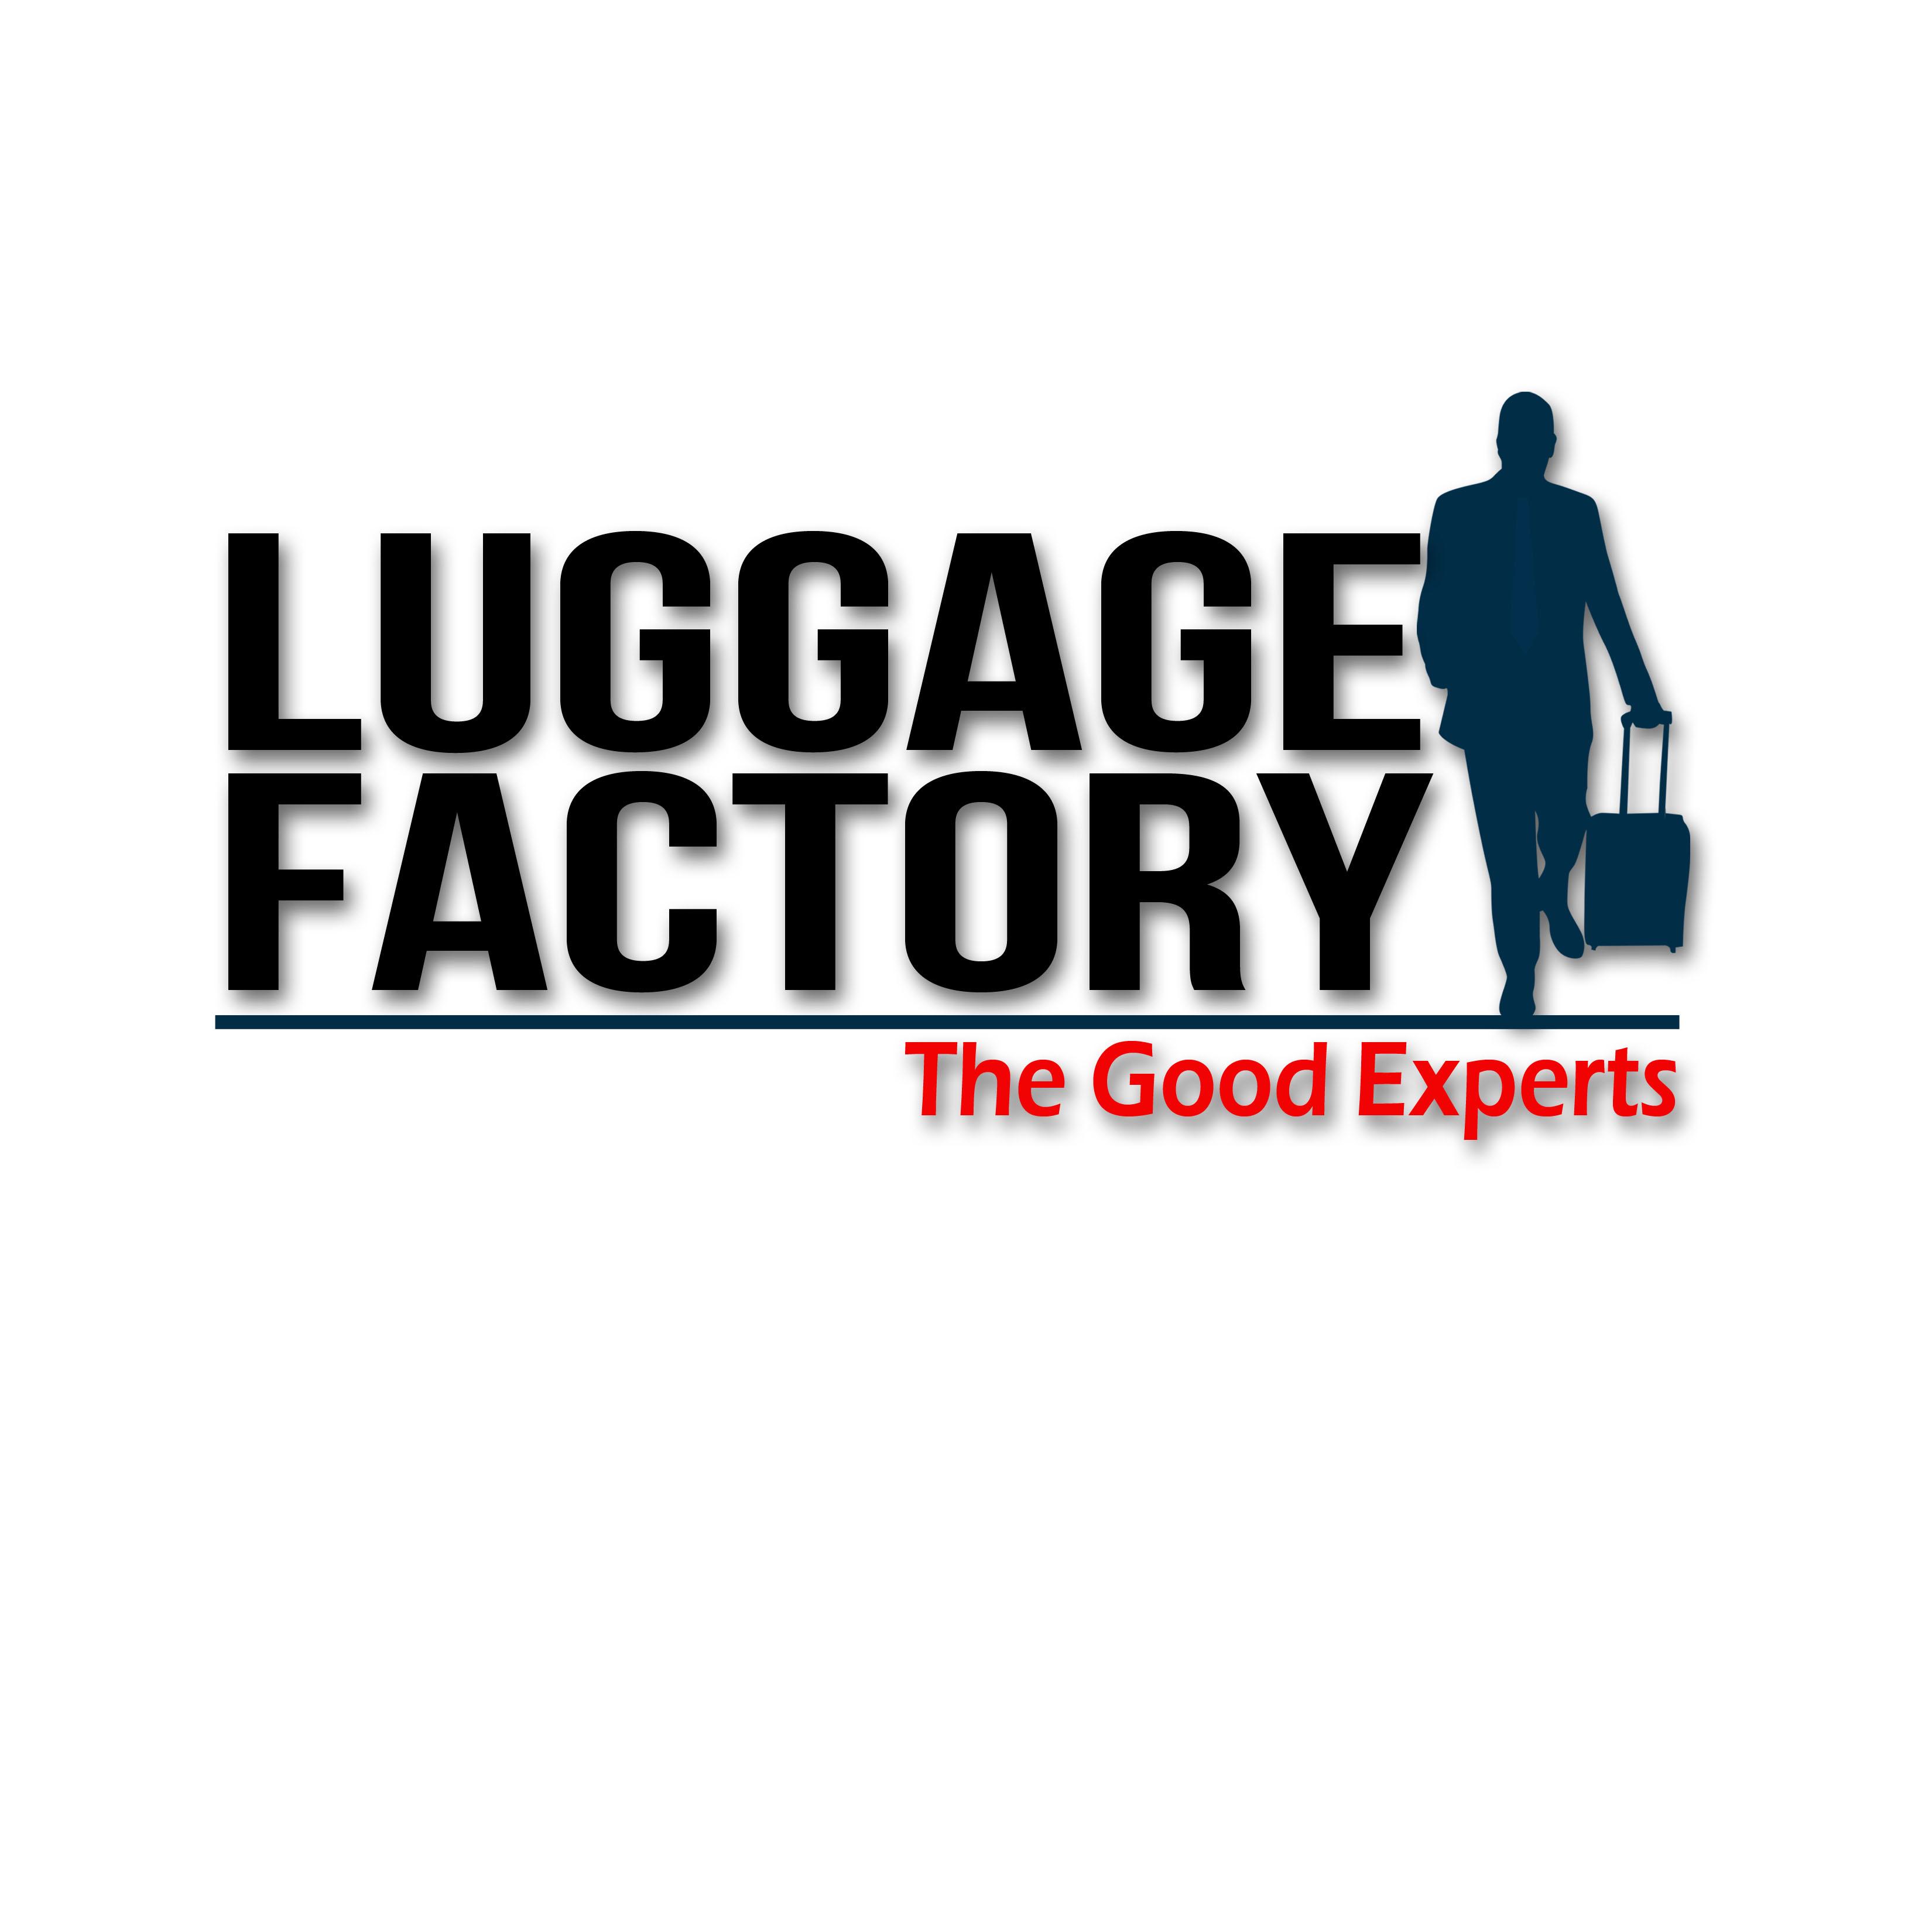 Logo Design by Allan Esclamado - Entry No. 225 in the Logo Design Contest Creative Logo Design for Luggage Factory.